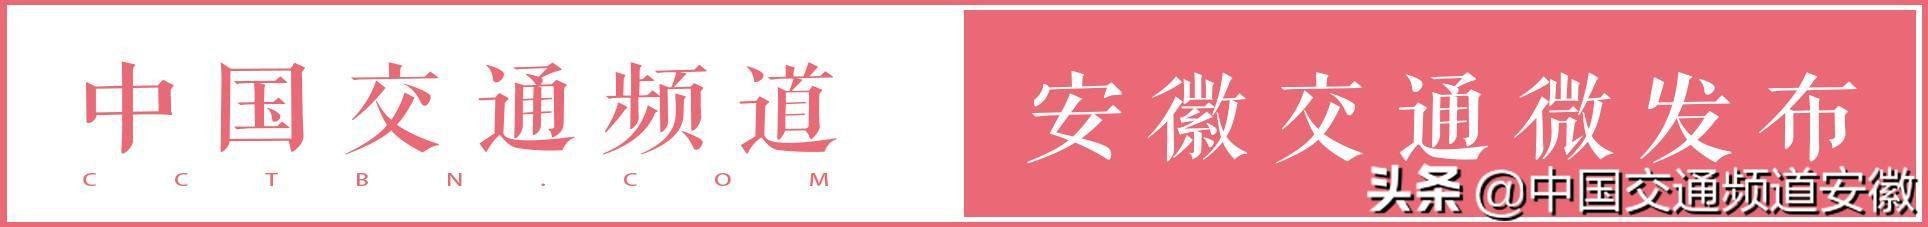 "<b>领车牌就像取快递 安徽首个""机动车号牌自取""系统启用</b>"